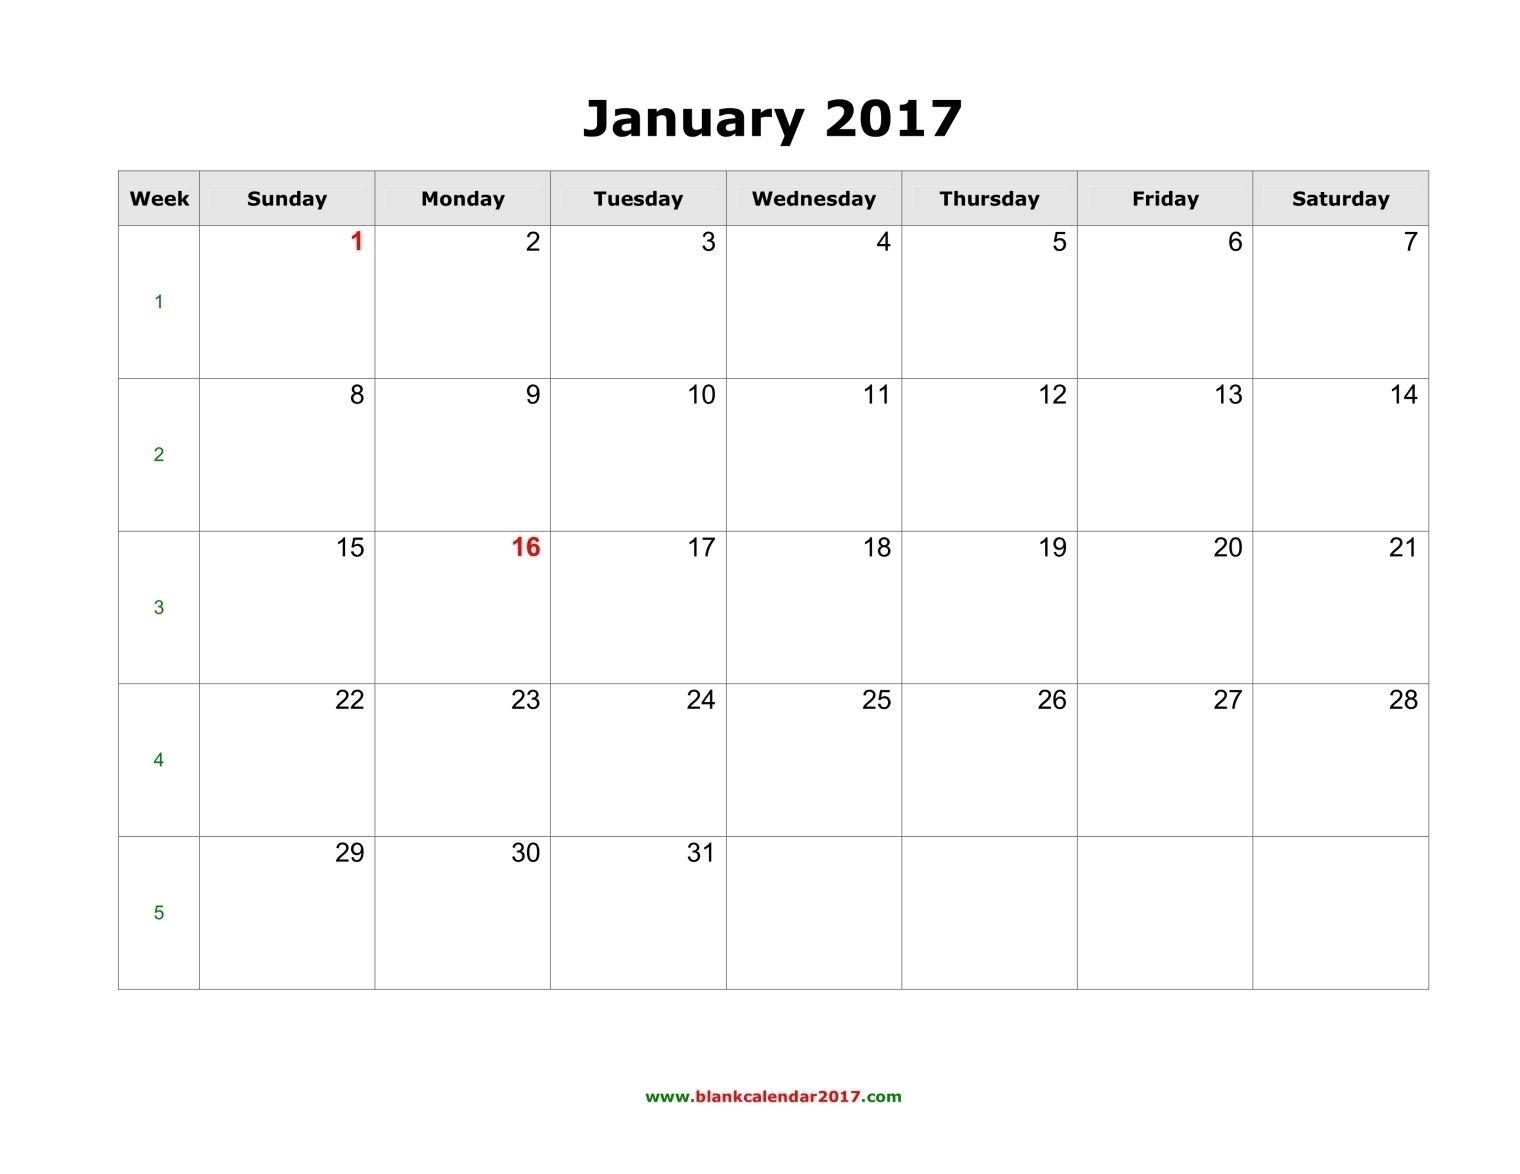 Monthly-2017-Calendar-Blank-Landscape-Printable-Psd-Doc